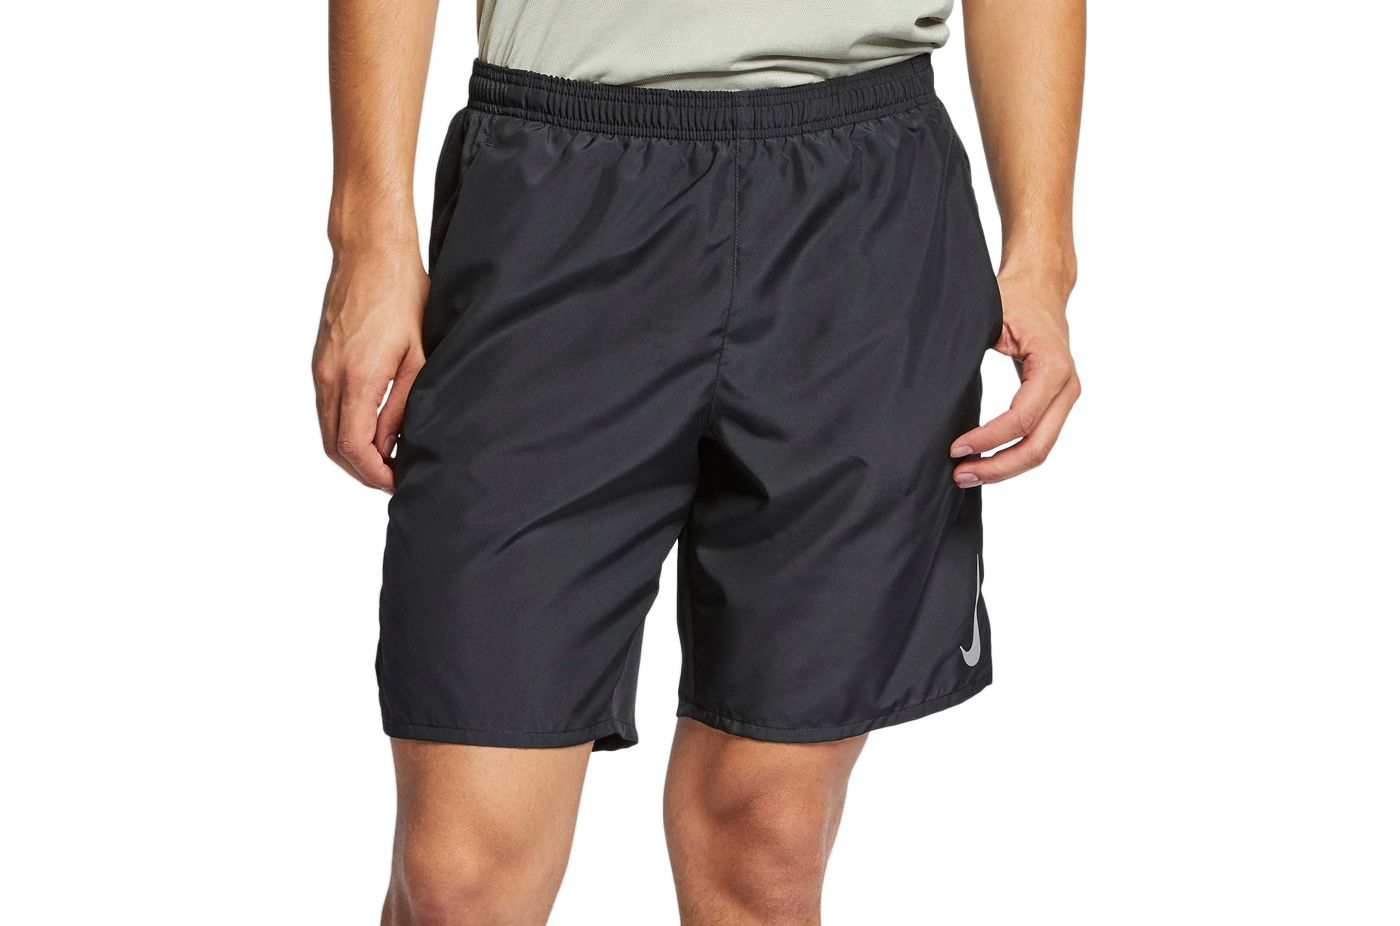 Nike Men's Dri-FIT Challenger 9'' Running Shorts